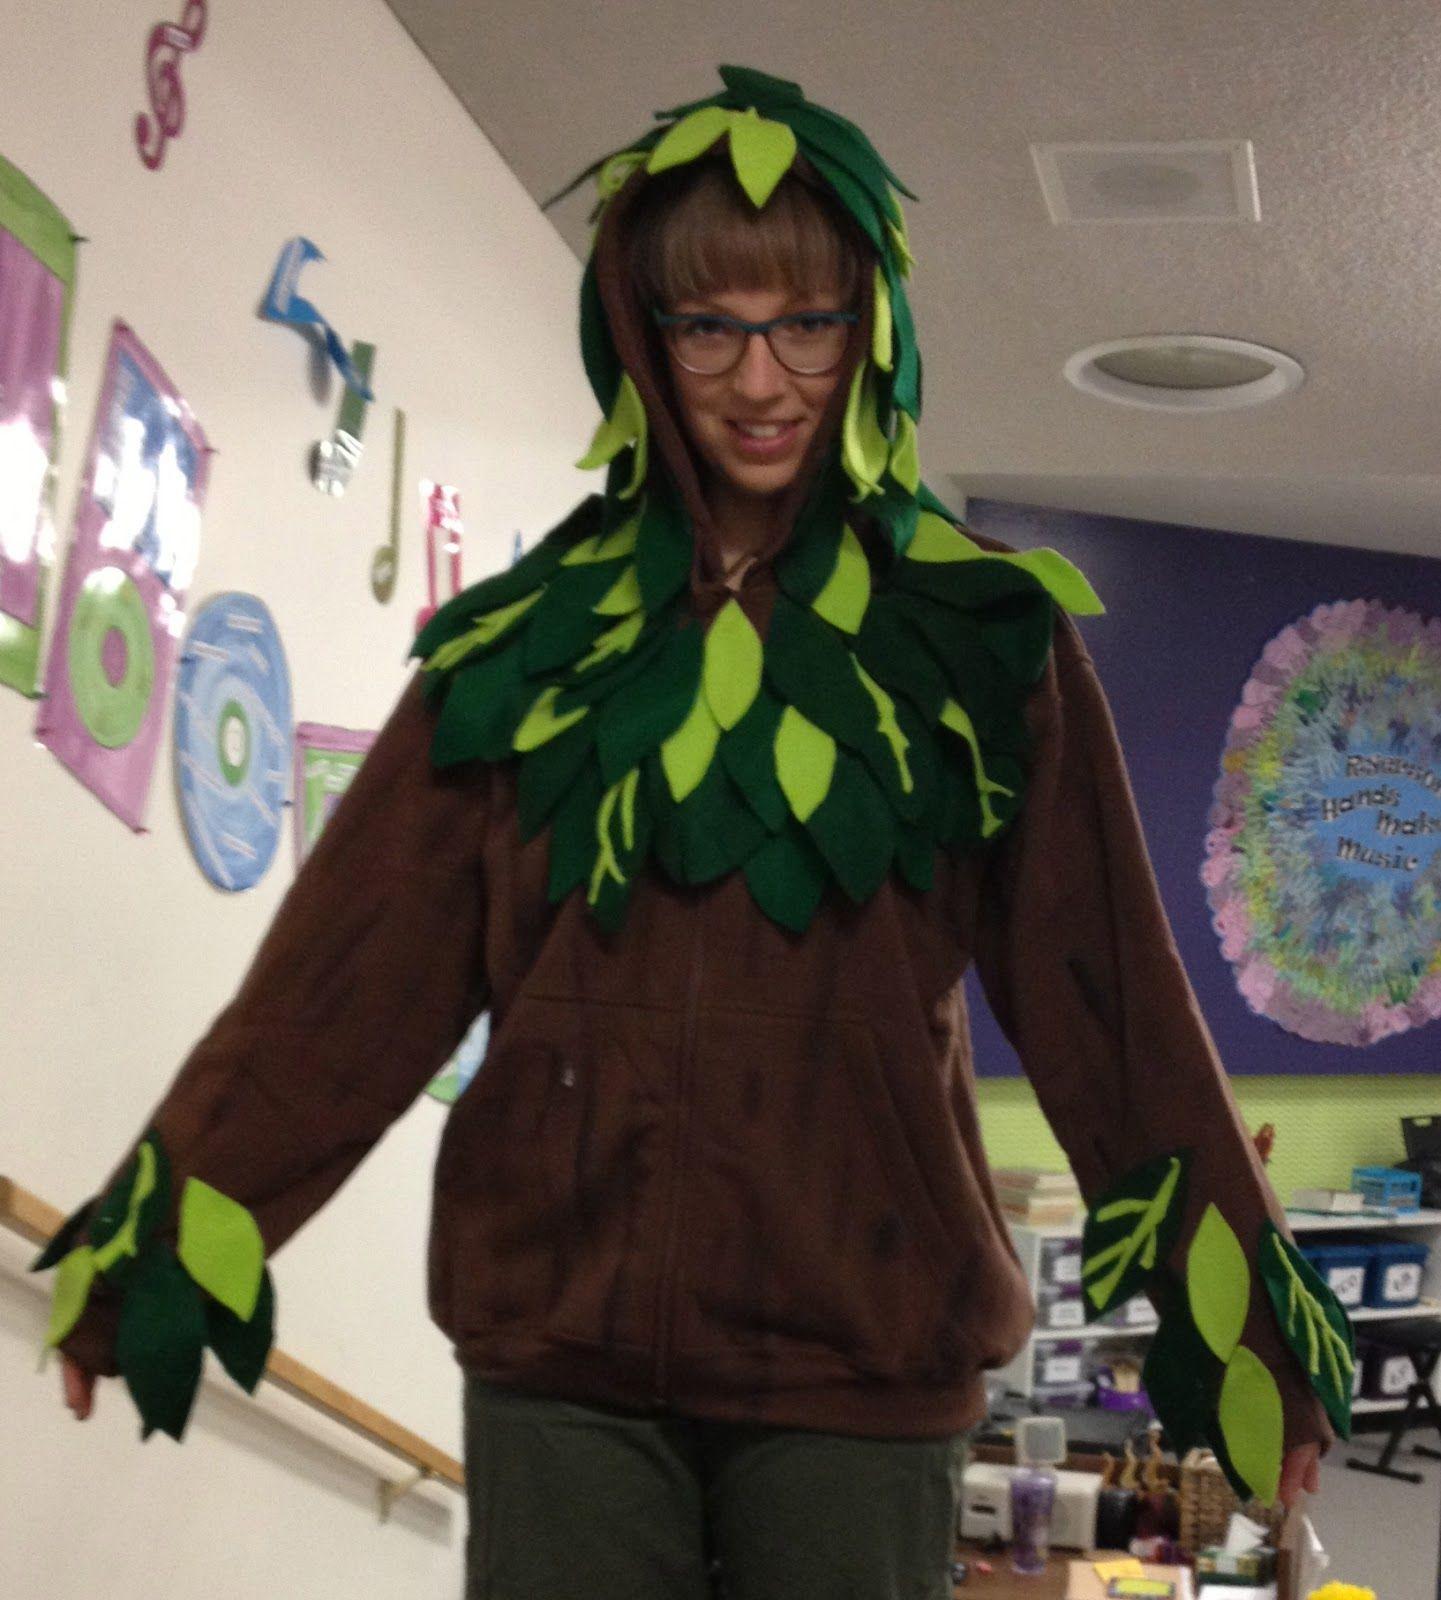 Homemade Tree Costumes For Children Ta Da Here I Am In